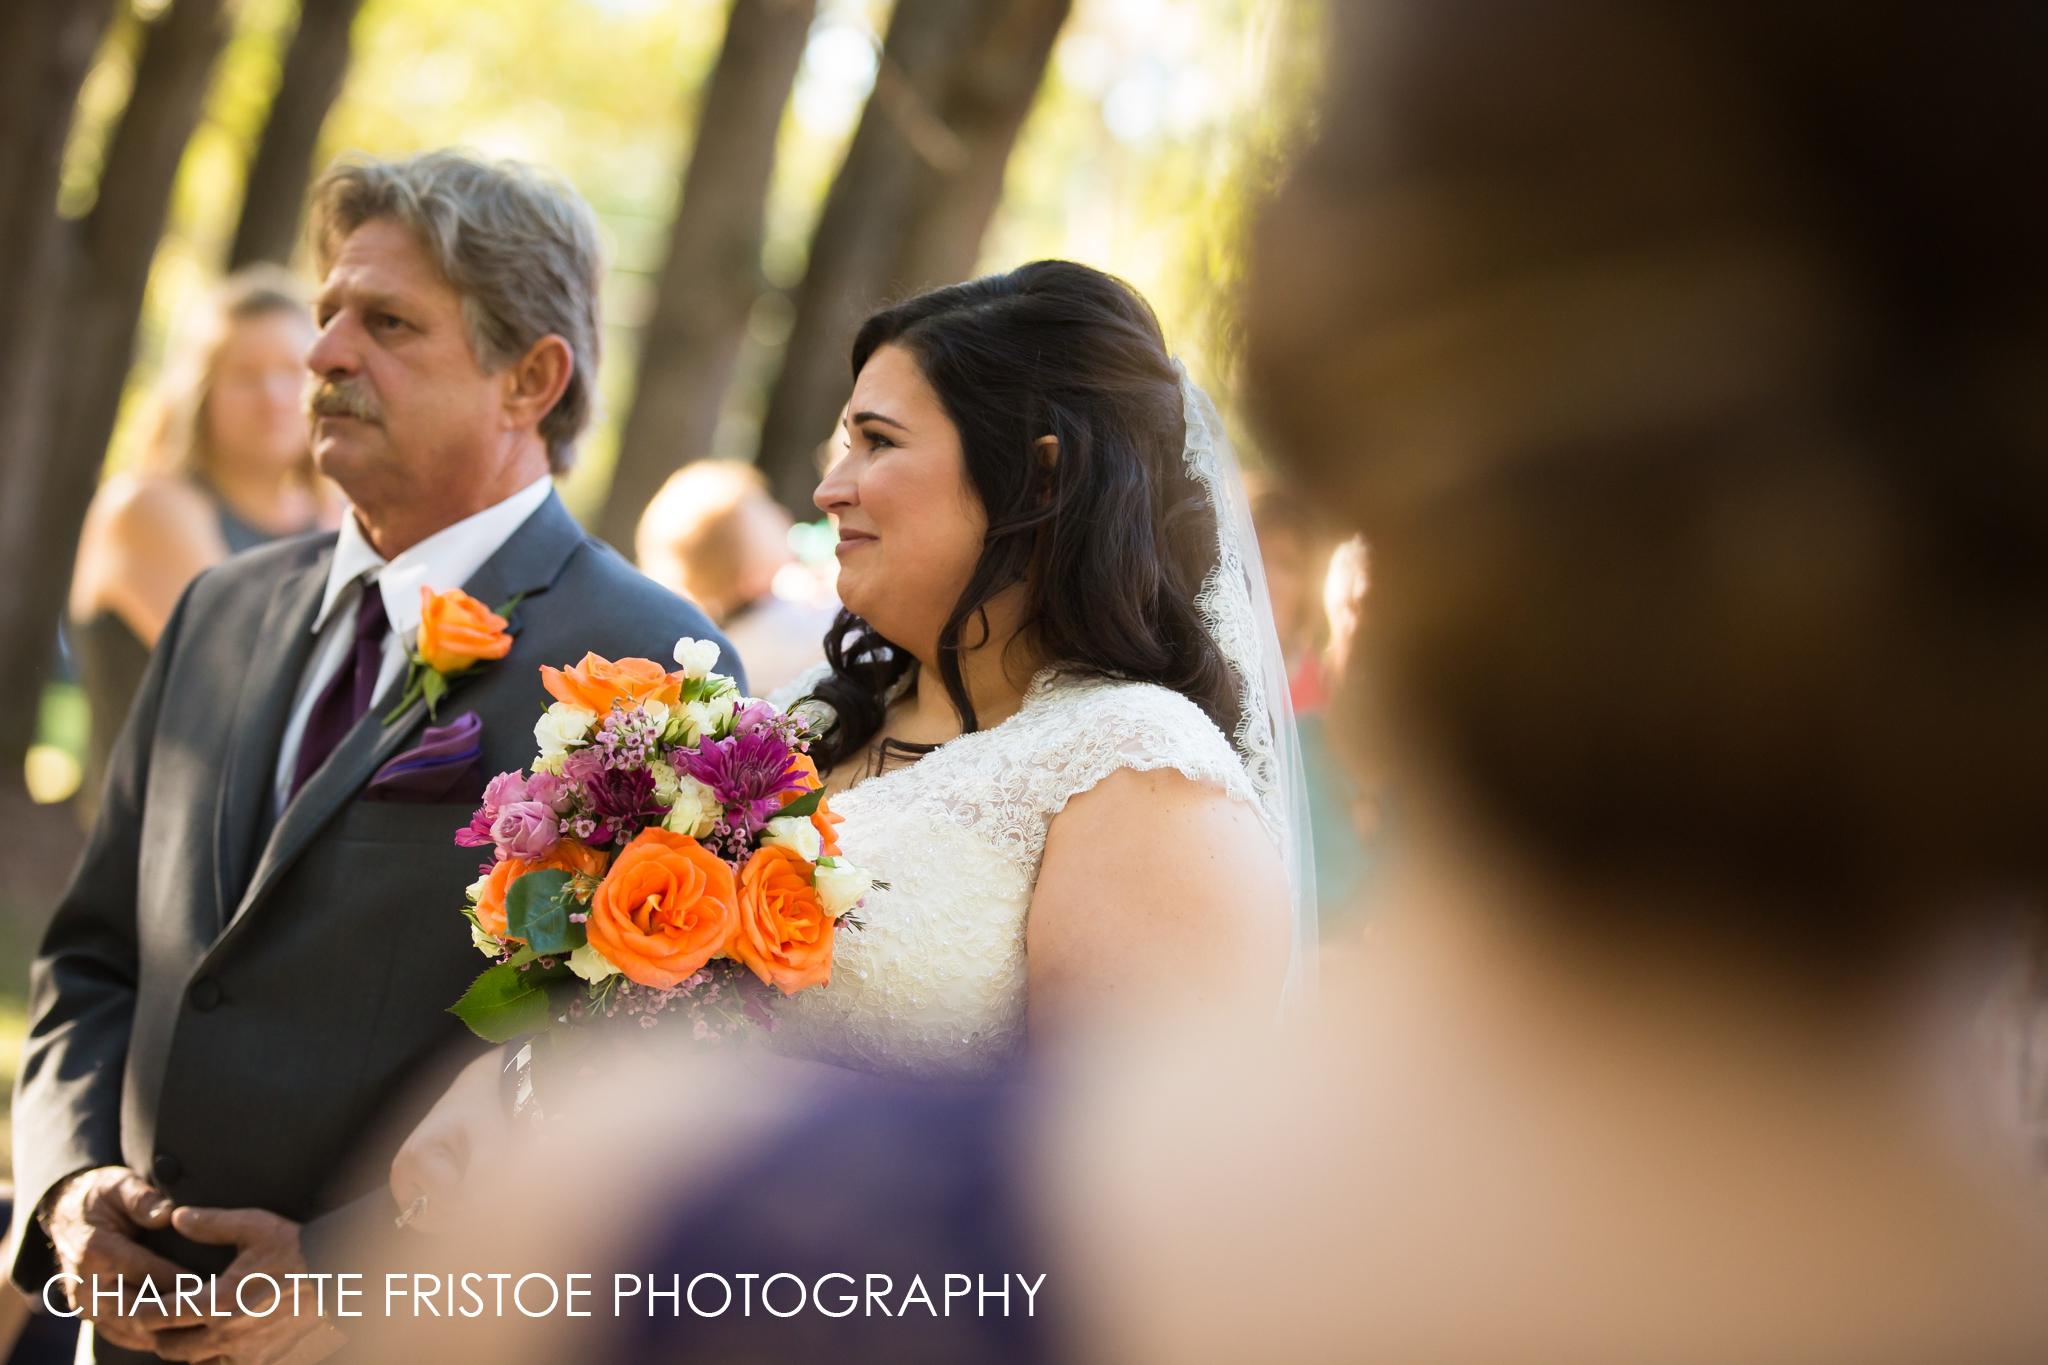 Lake Iamonia Wedding Charlotte Fristoe Photography-35.jpg